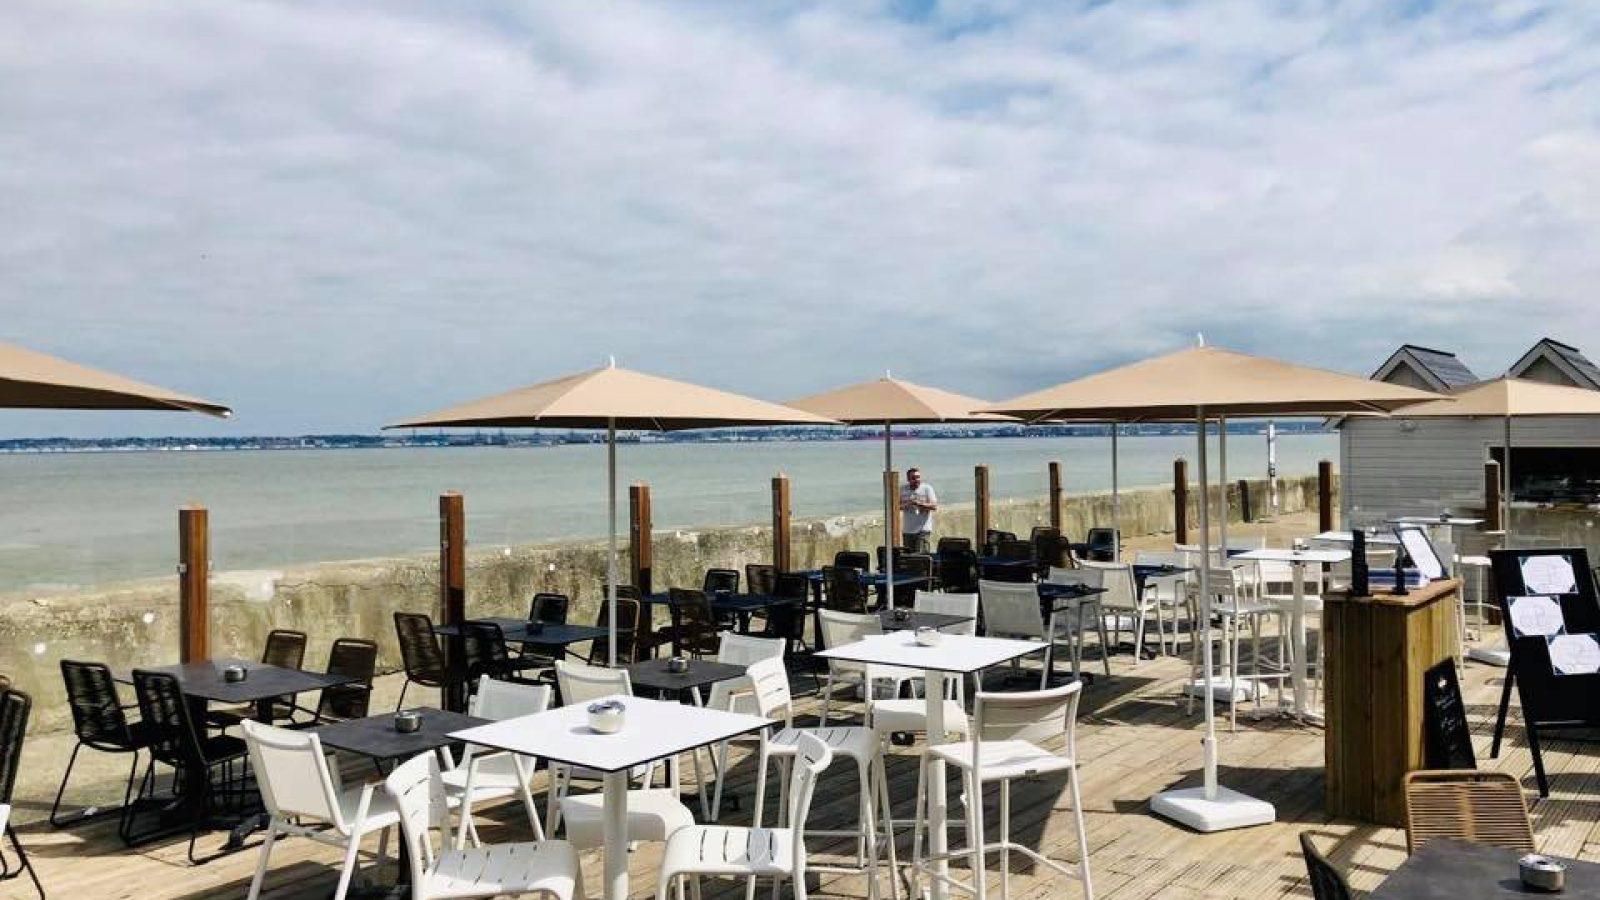 Le Paquebot-restaurant-terrasse-vue mer-Deauville-Villerville-Normandie